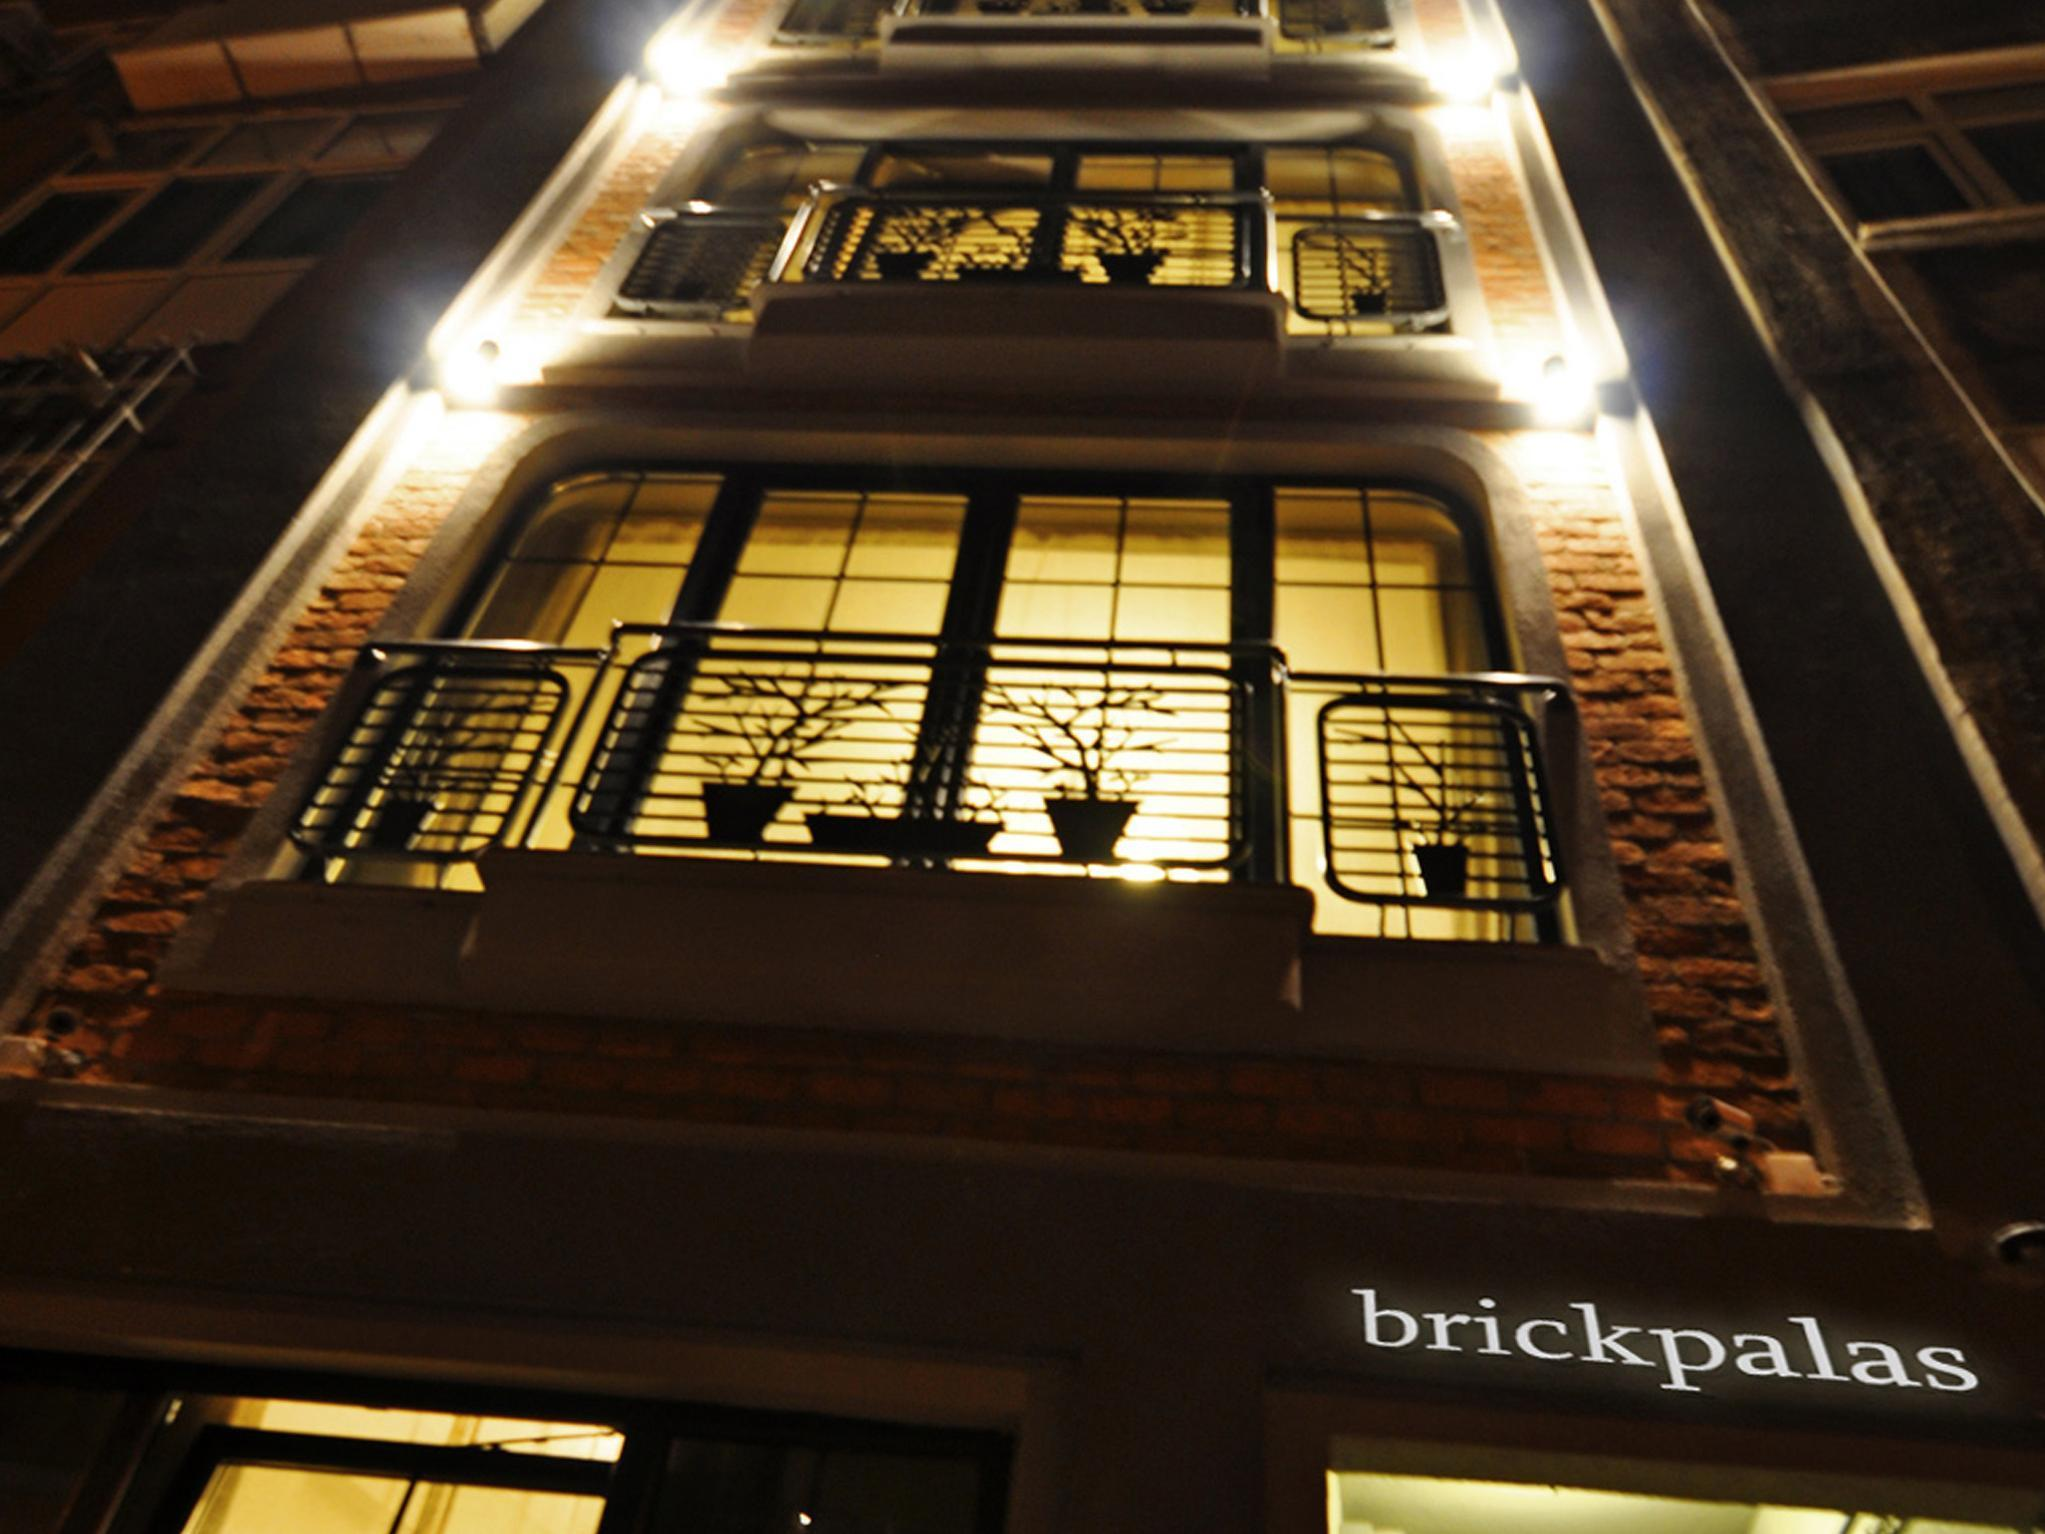 Brickpalas